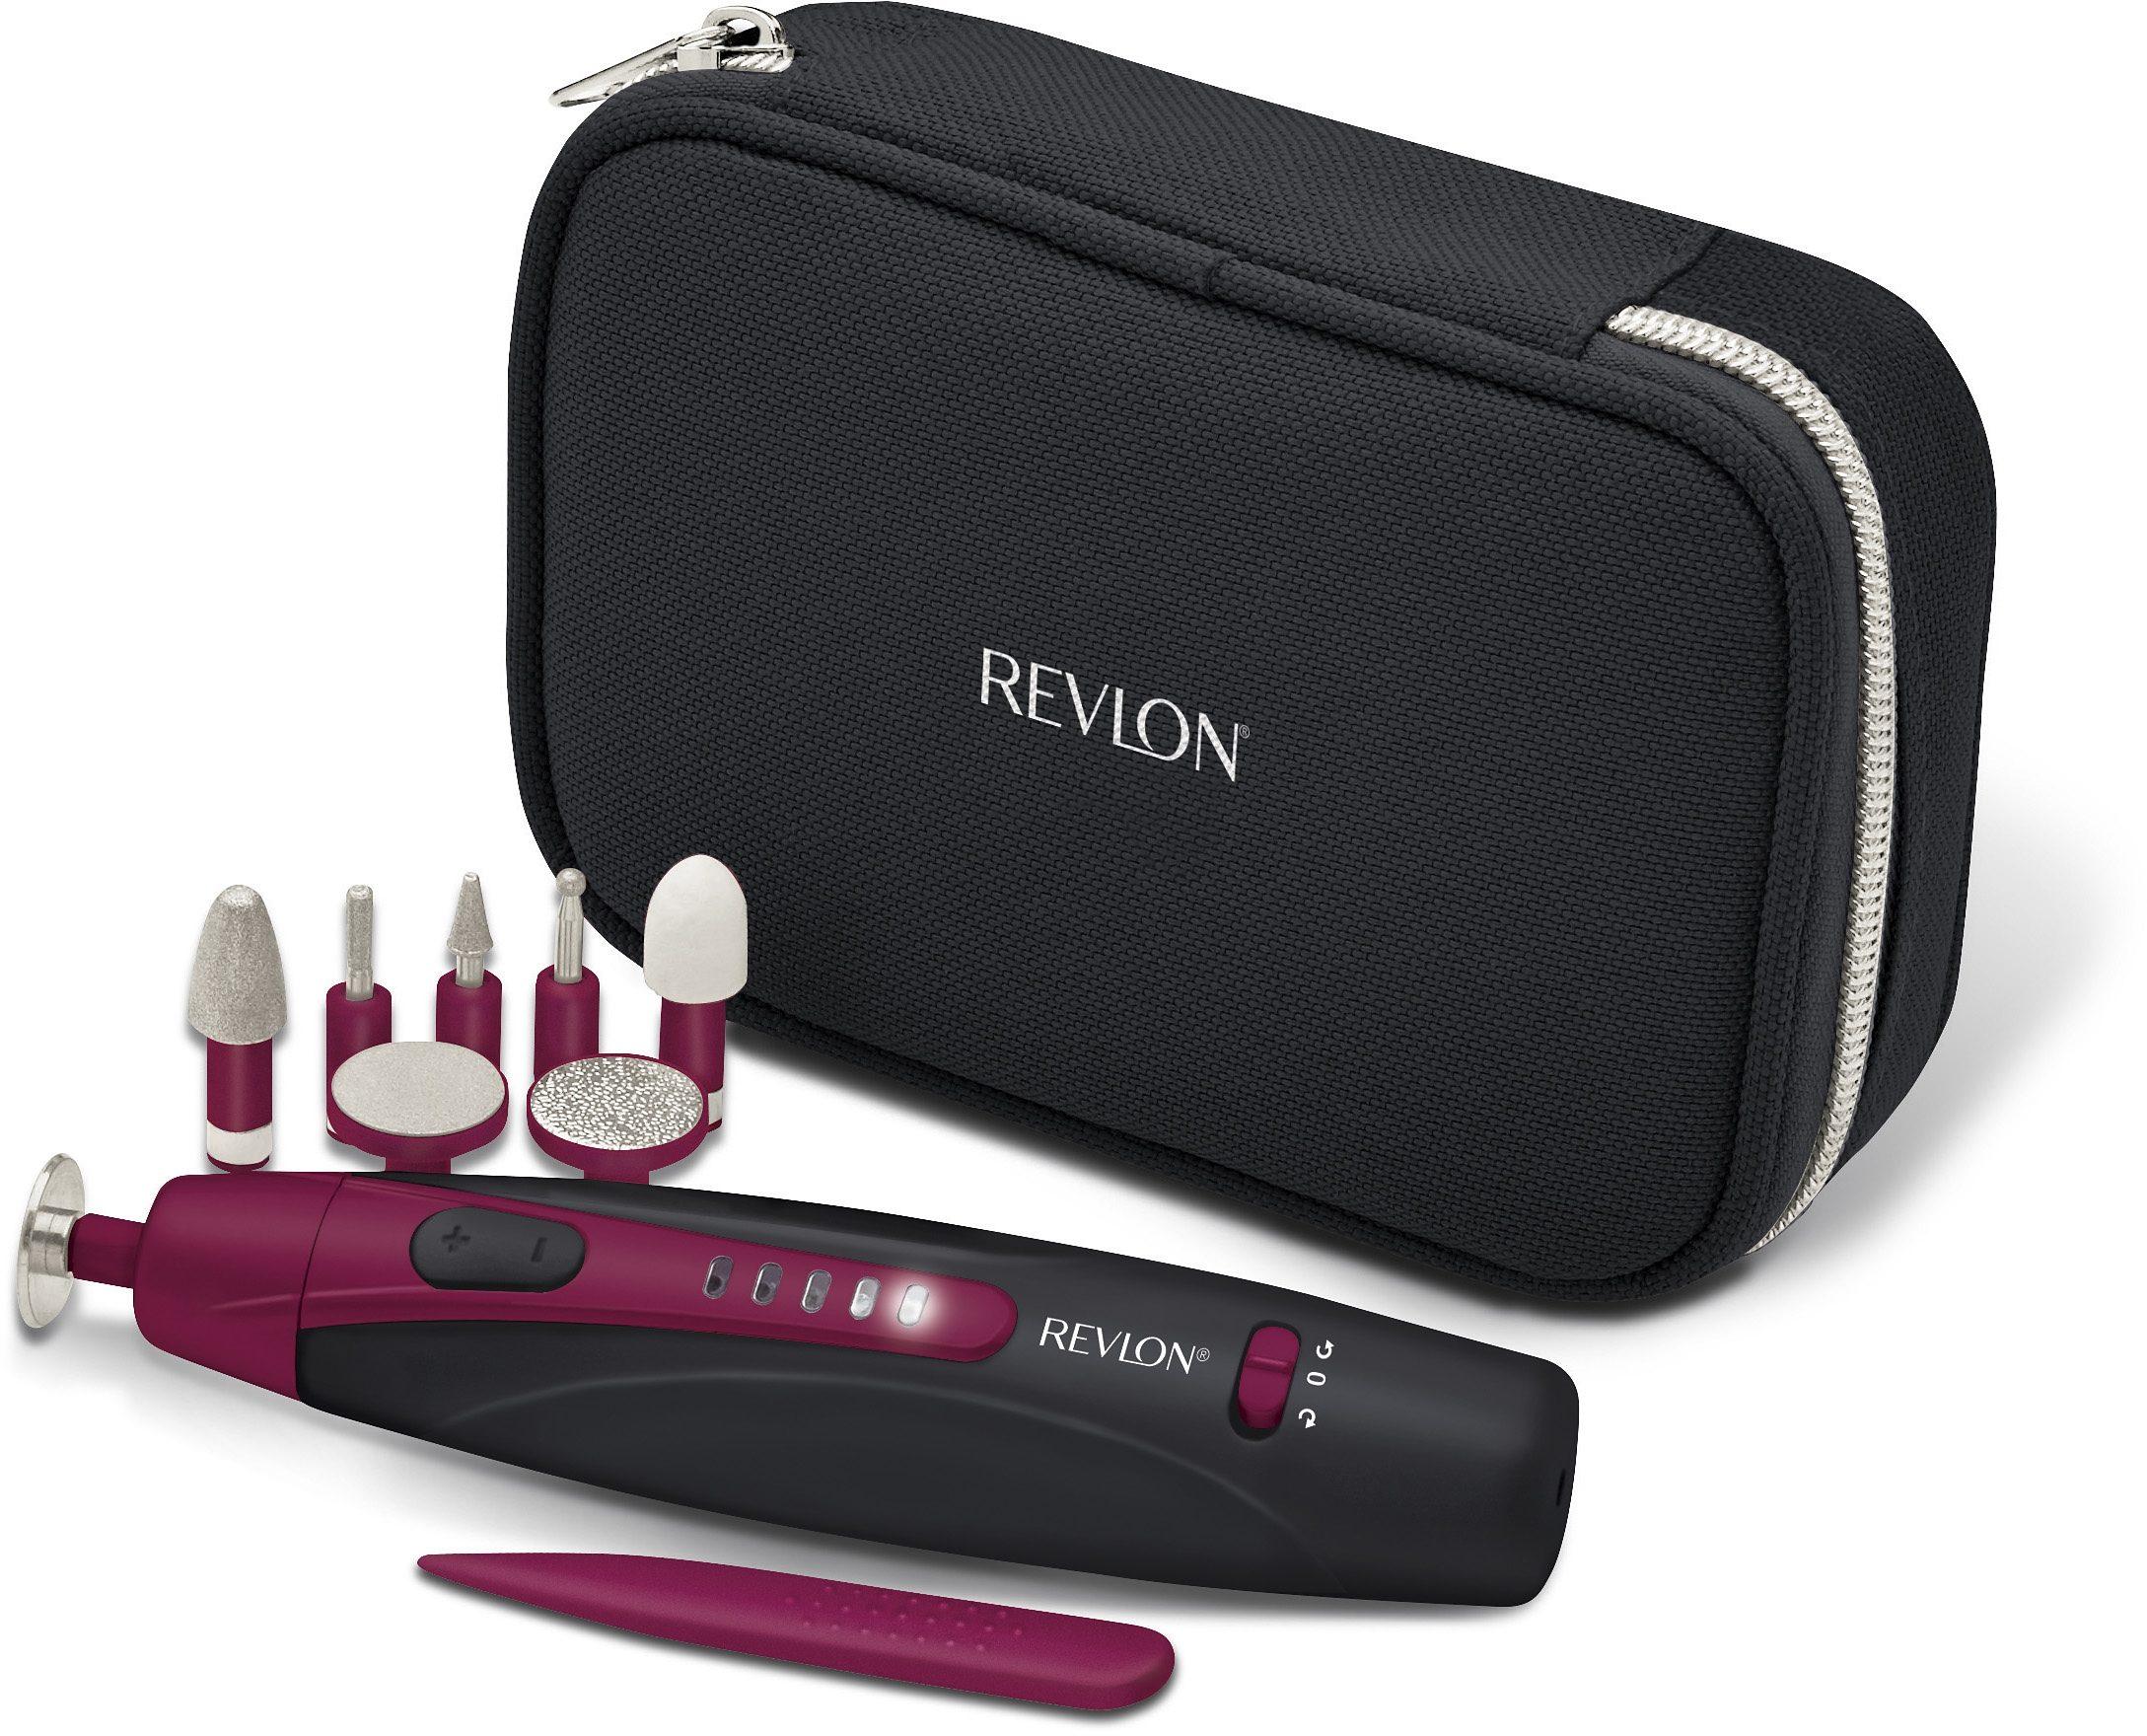 Revlon® Pediküre/Maniküre-Gerät TRAVEL CHIC RVSP3527E, Universell einsetzbar